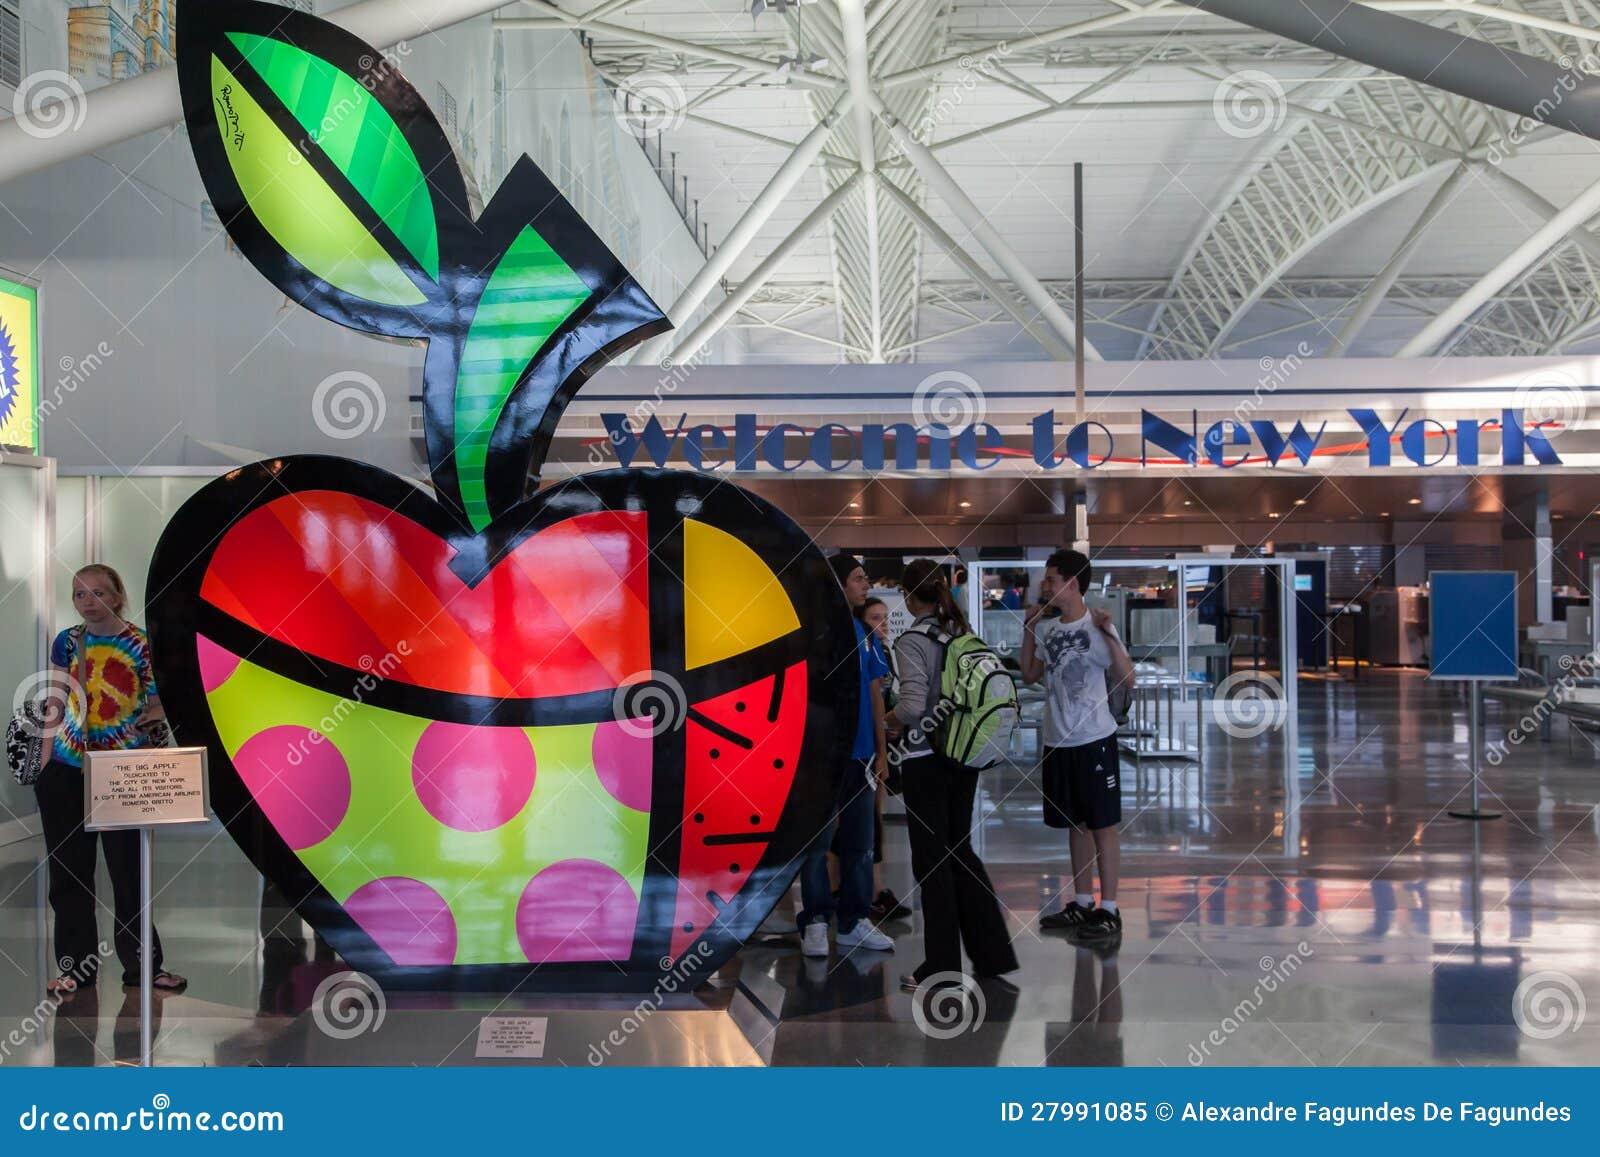 Aeroporto New York John F Kennedy : Aeroporto new york city de jfk imagem editorial